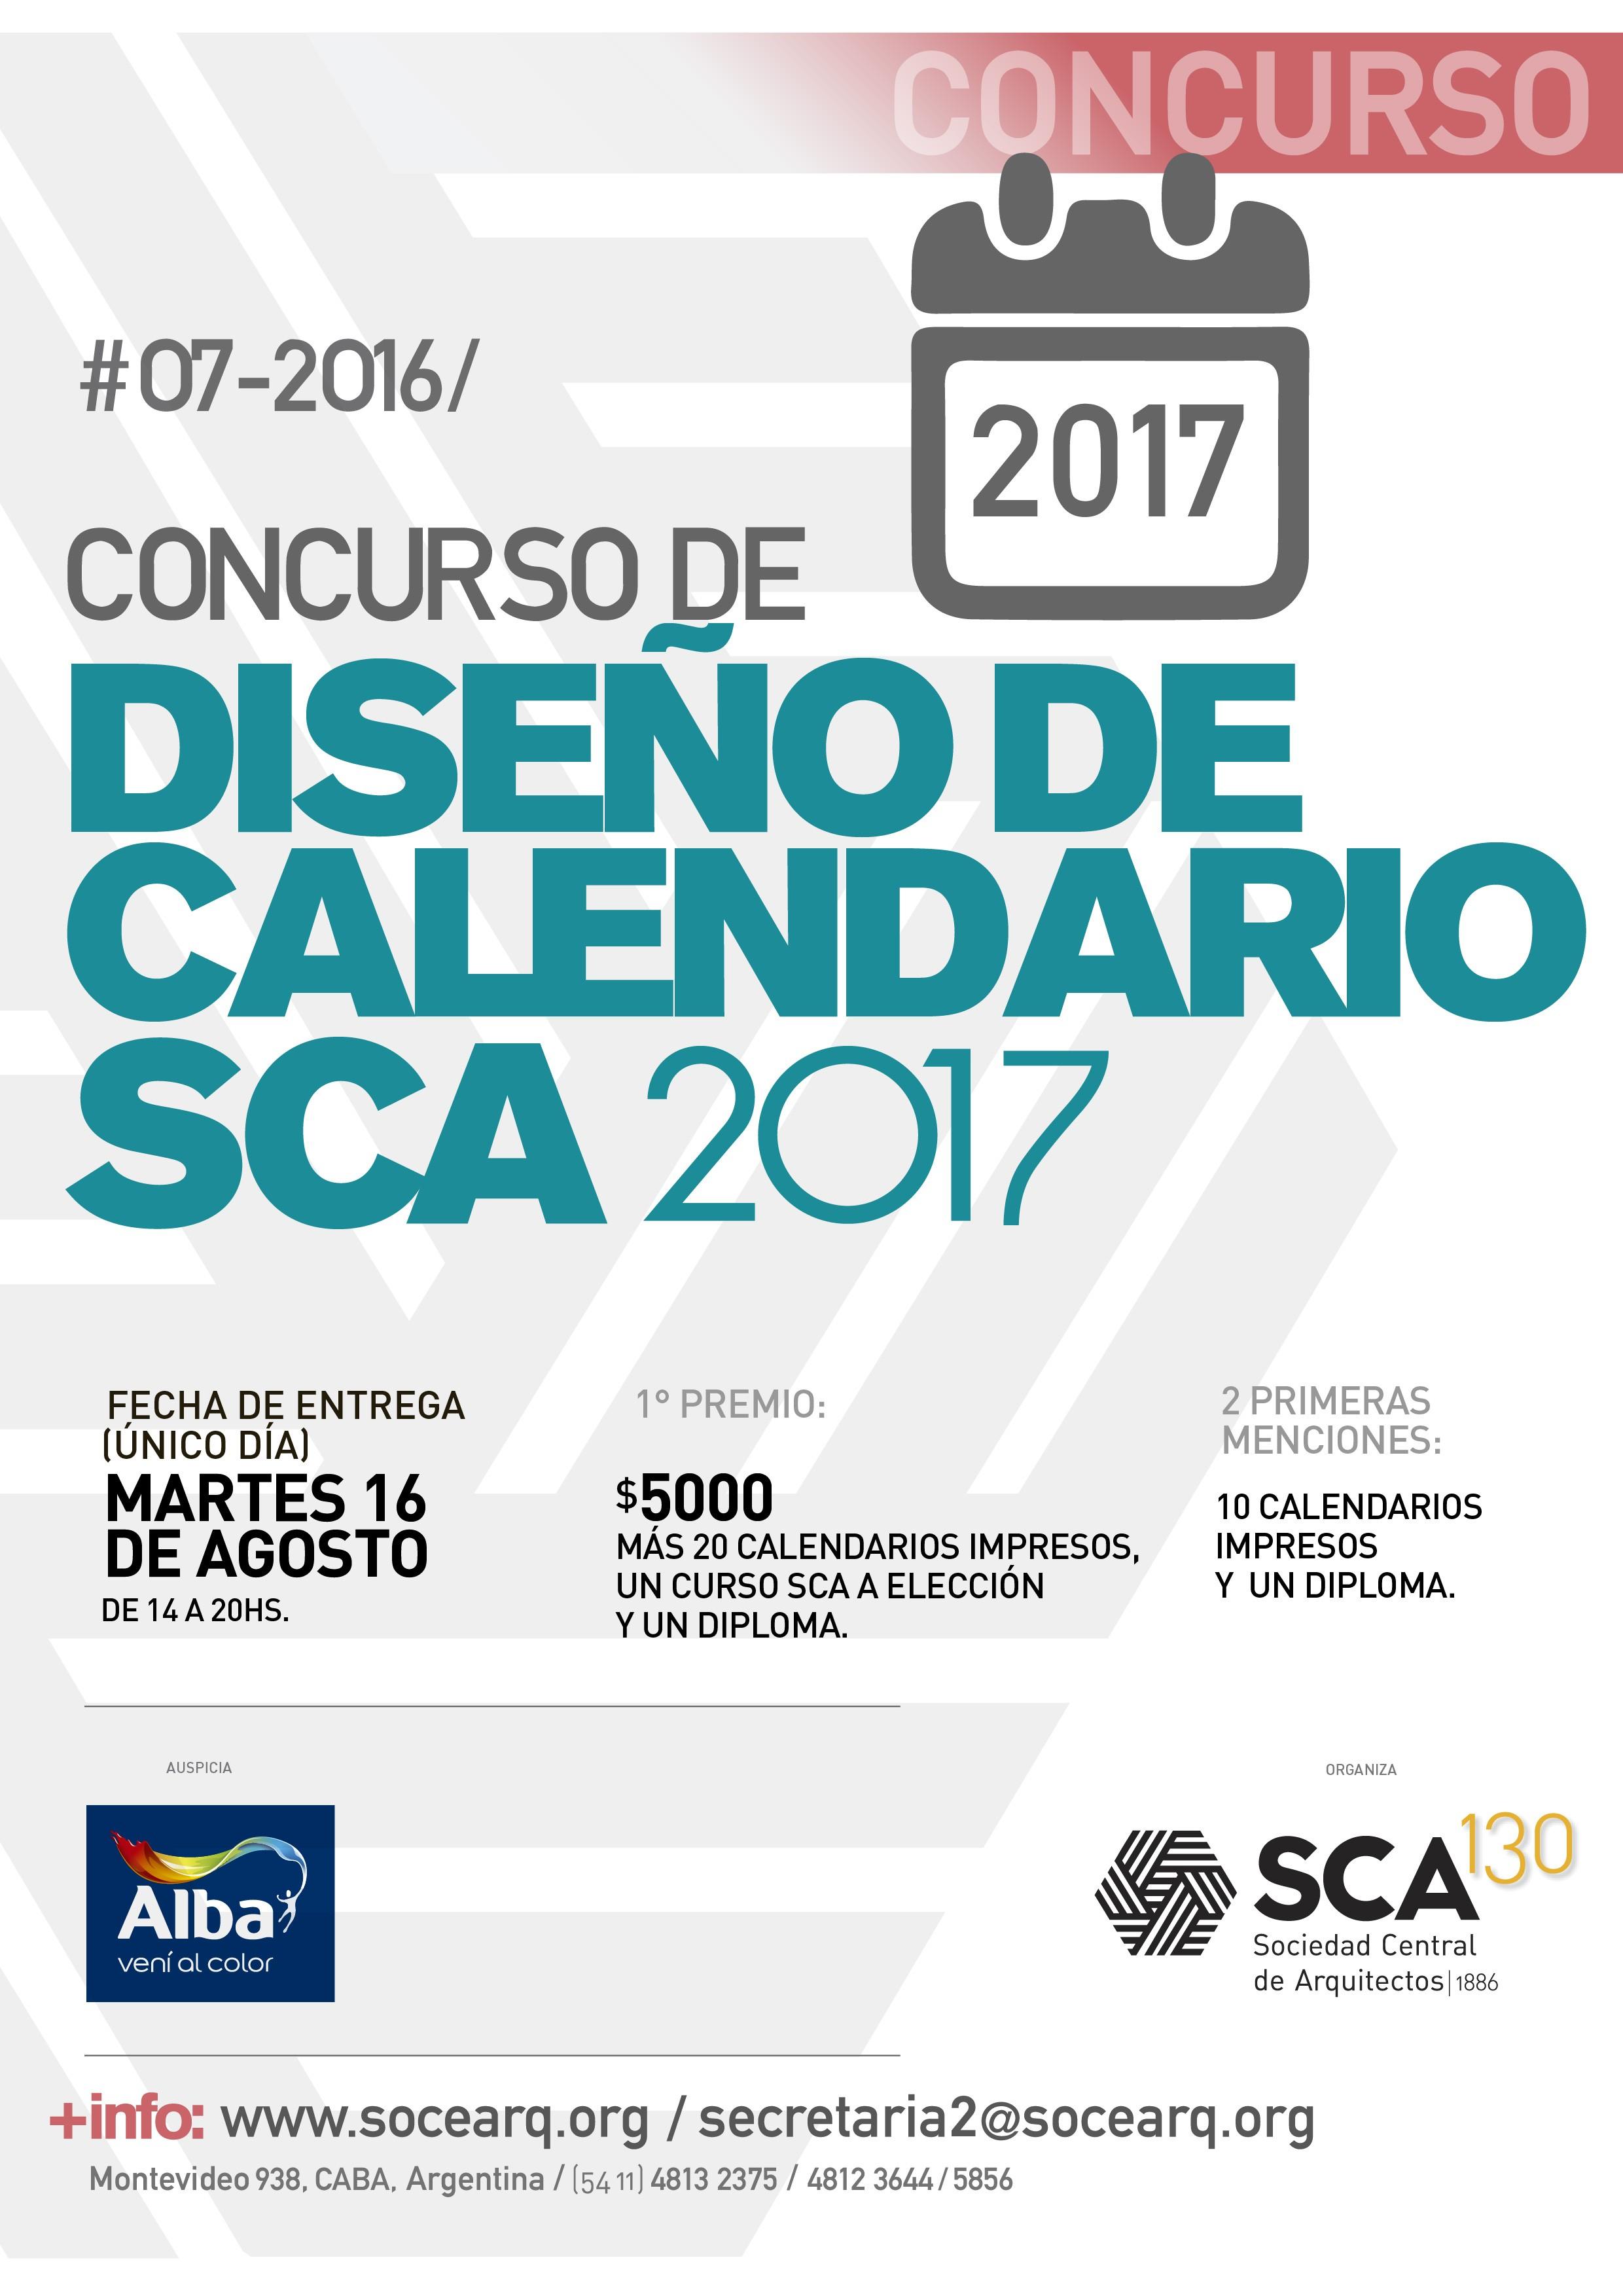 Calendario Escolar 2019 Argentina Caba Actual Concursos Of Calendario Escolar 2019 Argentina Caba Recientes Impreso 01 Mayo 18 Pages 1 40 Text Version